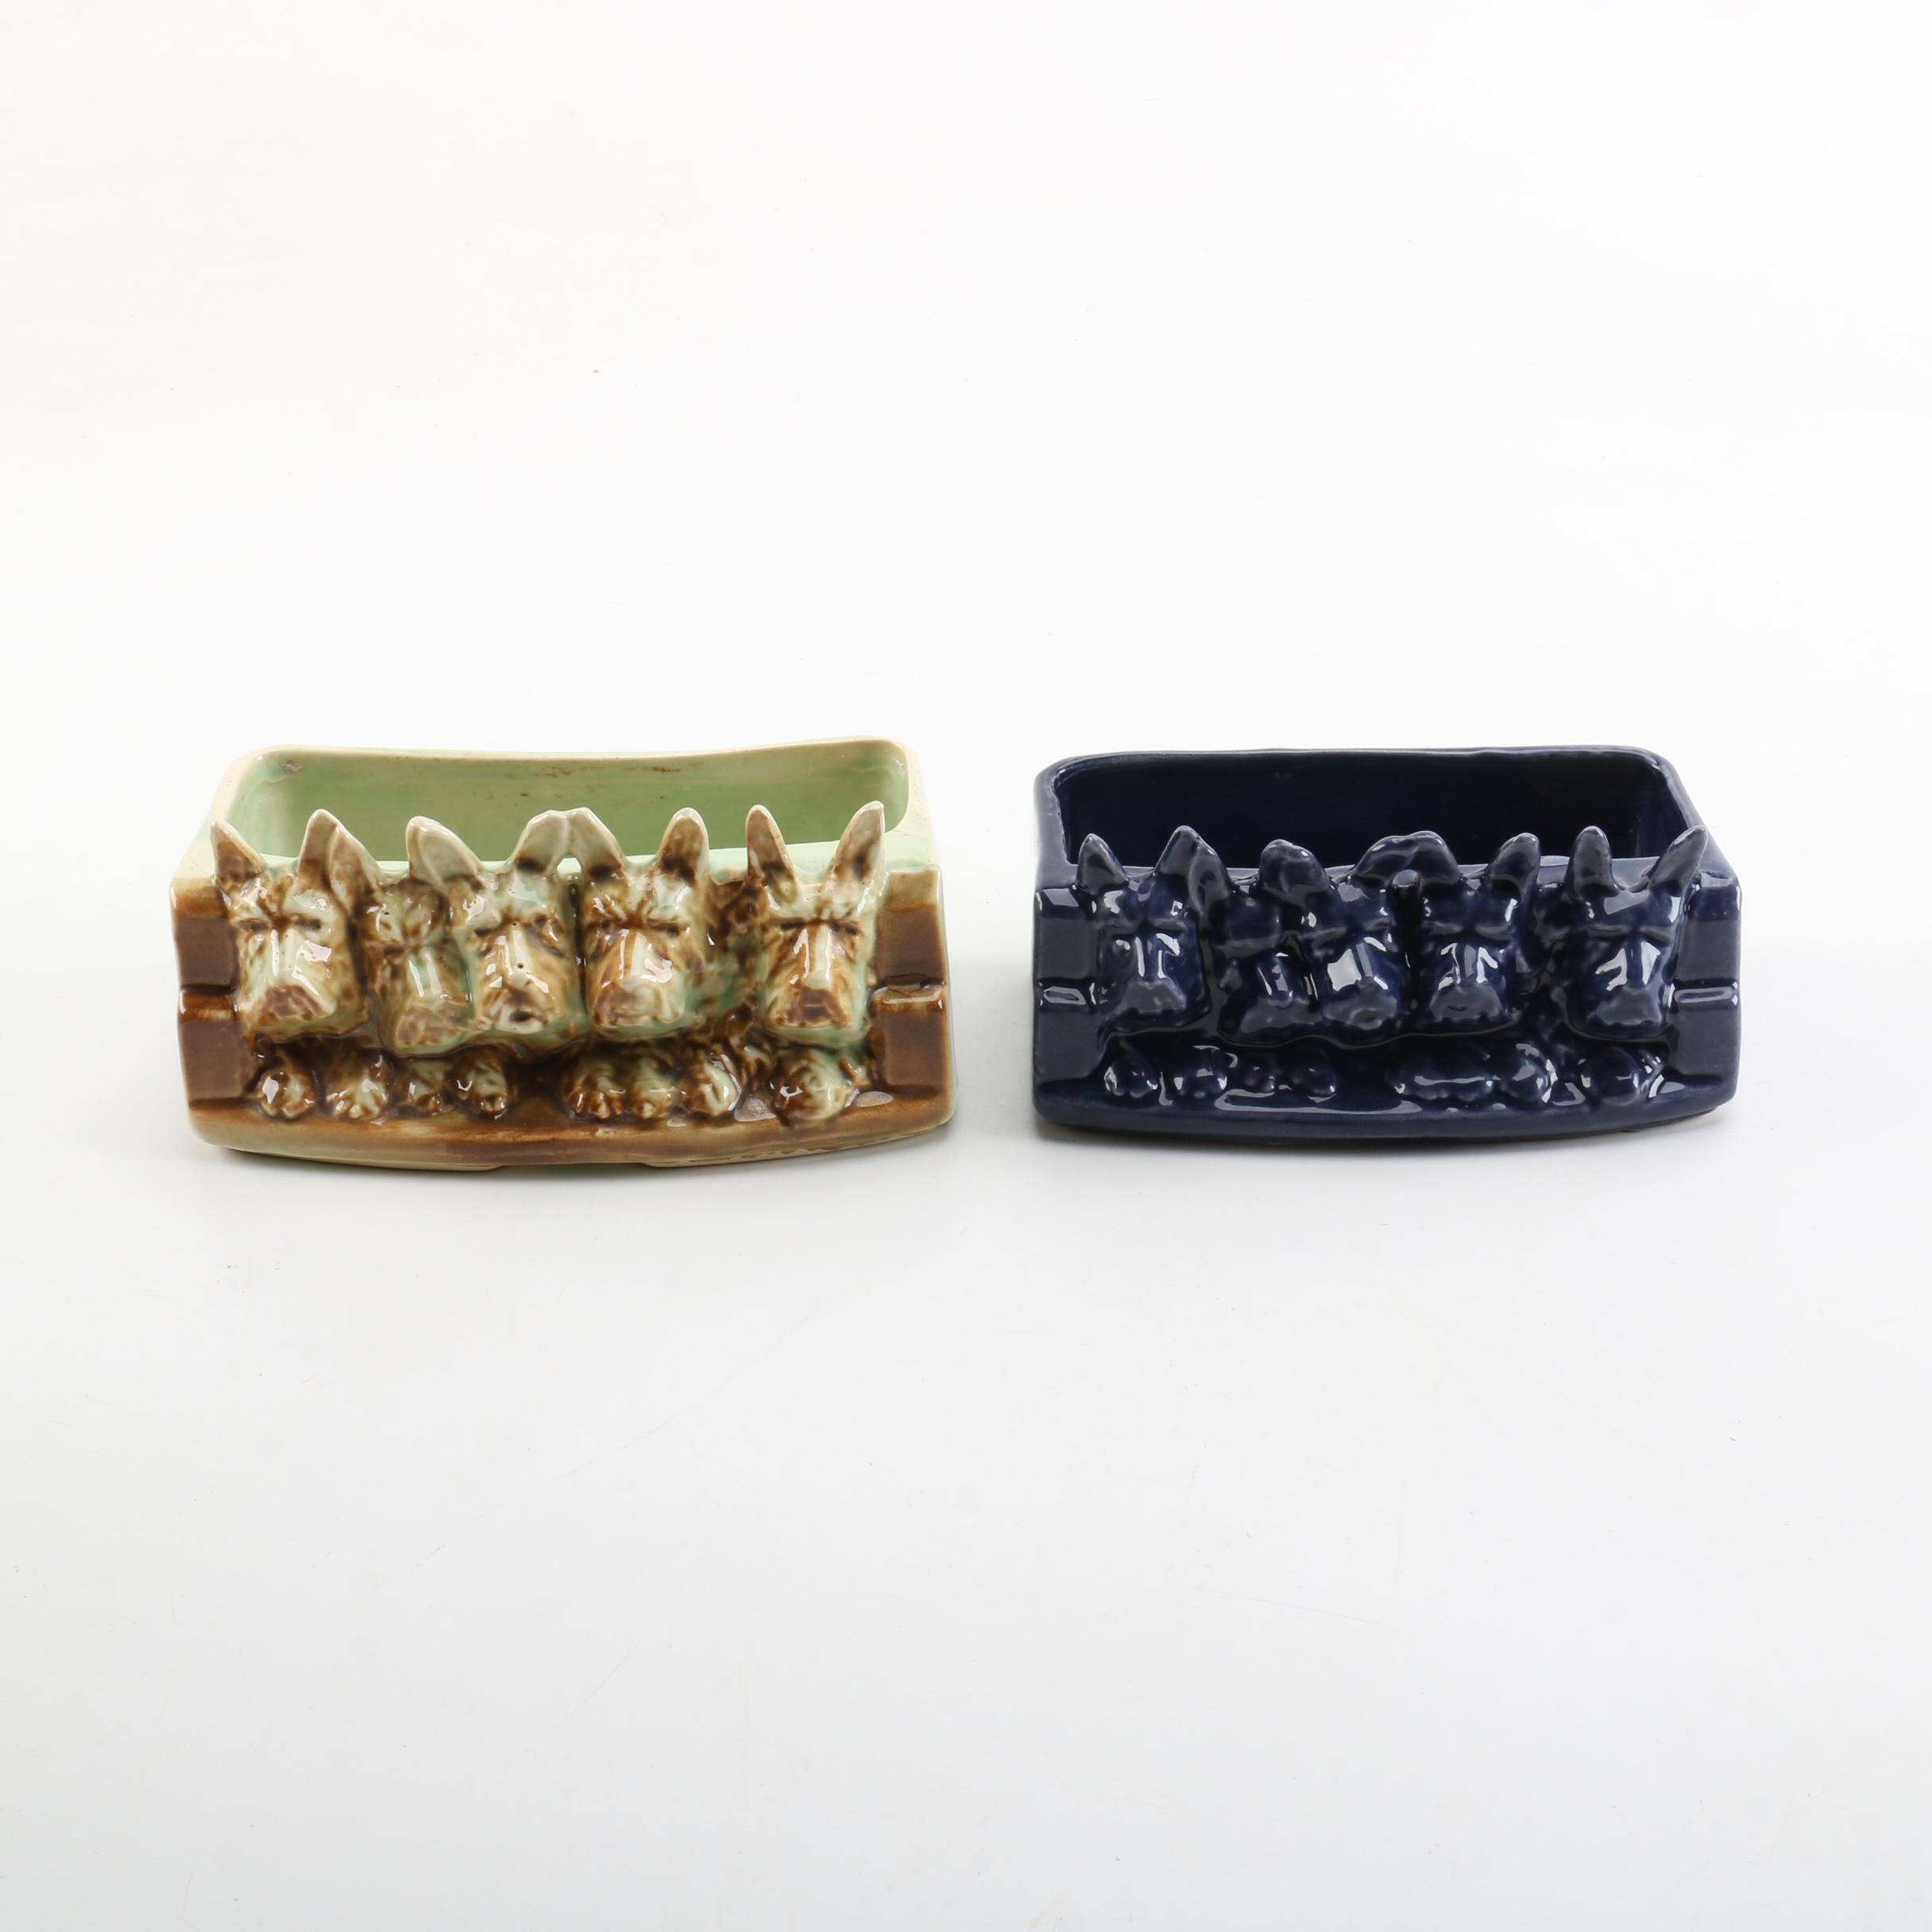 Vintage McCoy Scottie Dog Rectangular Ceramic Planters